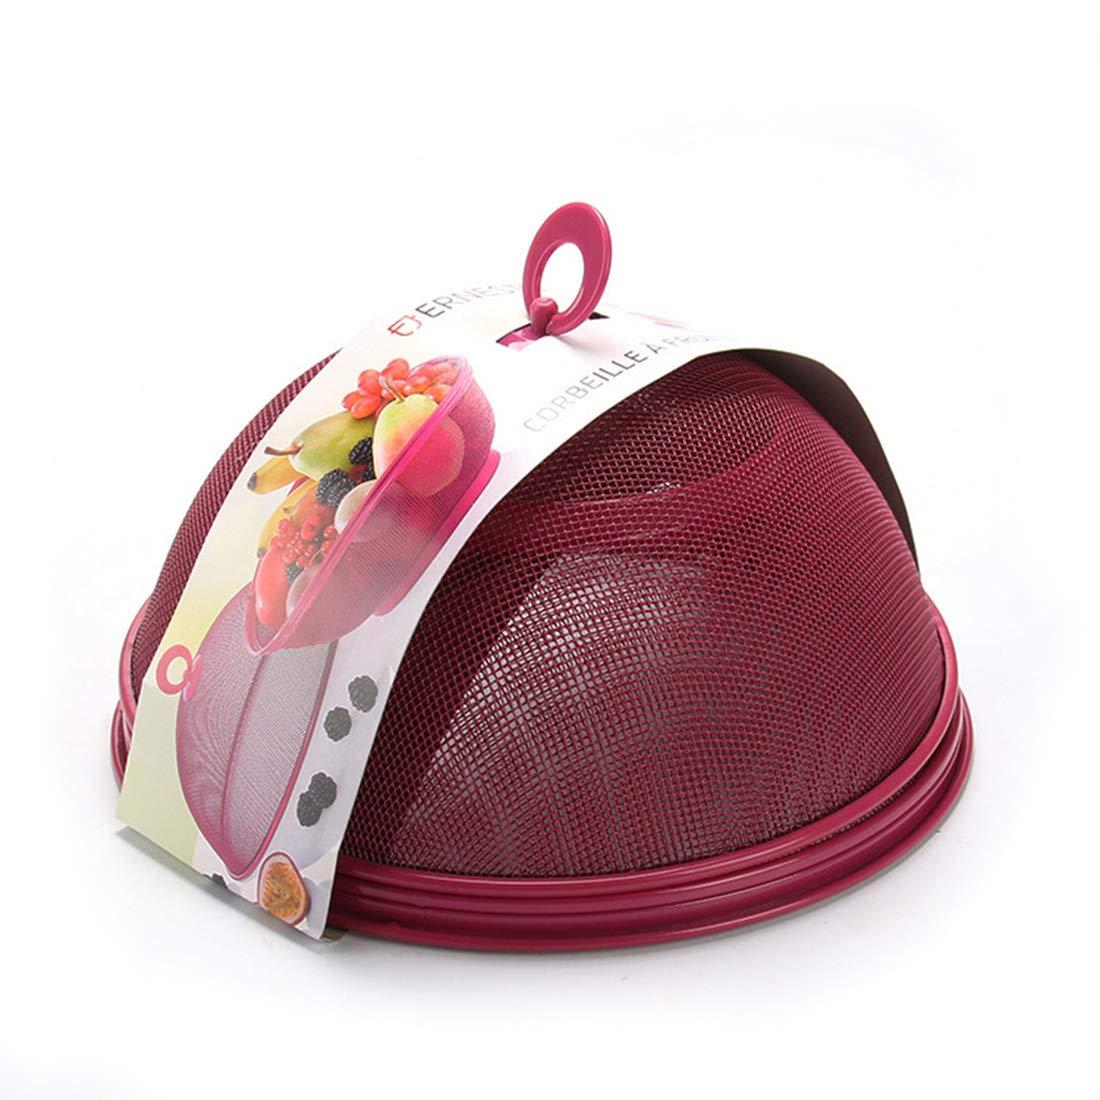 JPAKIOS キッチンガジェットフルーツバスケットは、果物のプレートを洗浄し、バスケットを排水を設定します。 (色 : 2 Colors)  2 Colors B07R6DBF7J